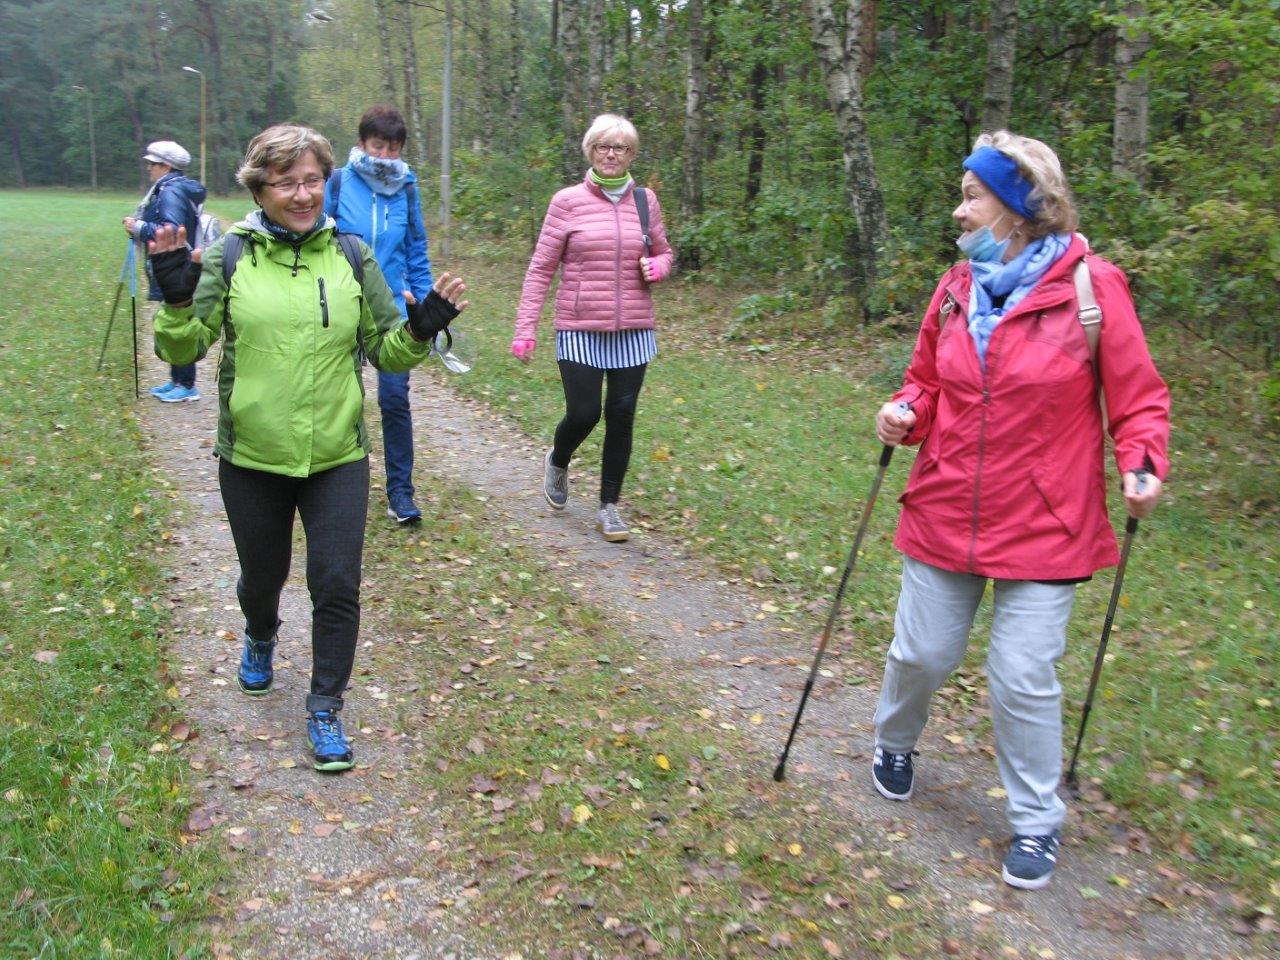 1.spacerują z kijkami nordic walking inni bez